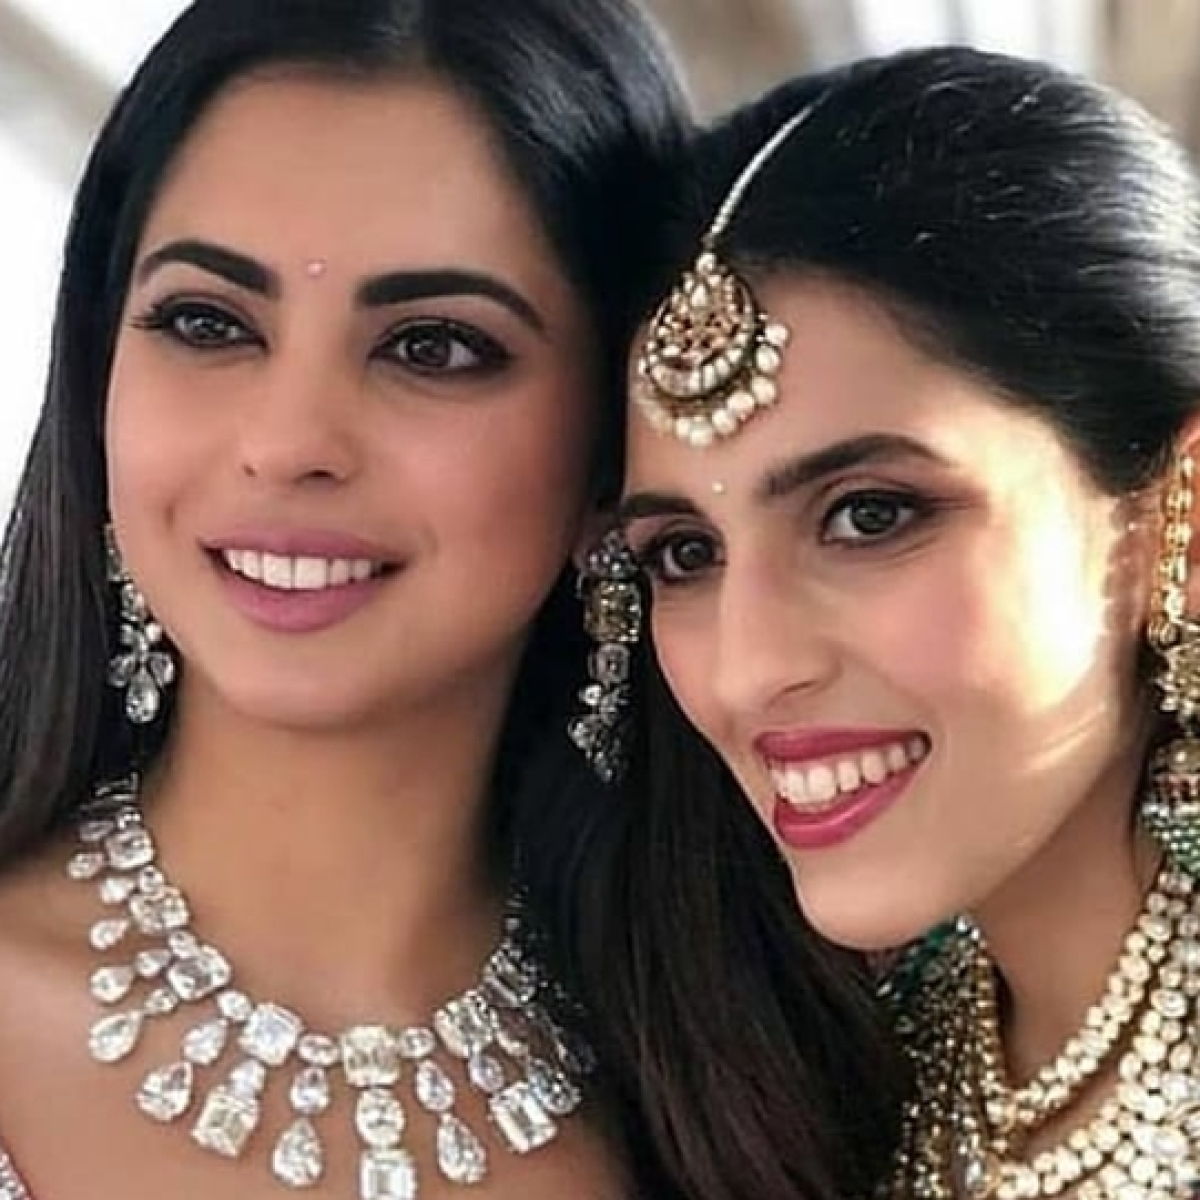 Isha Ambani, Shloka Mehta to ring in their first Karva Chauth this year